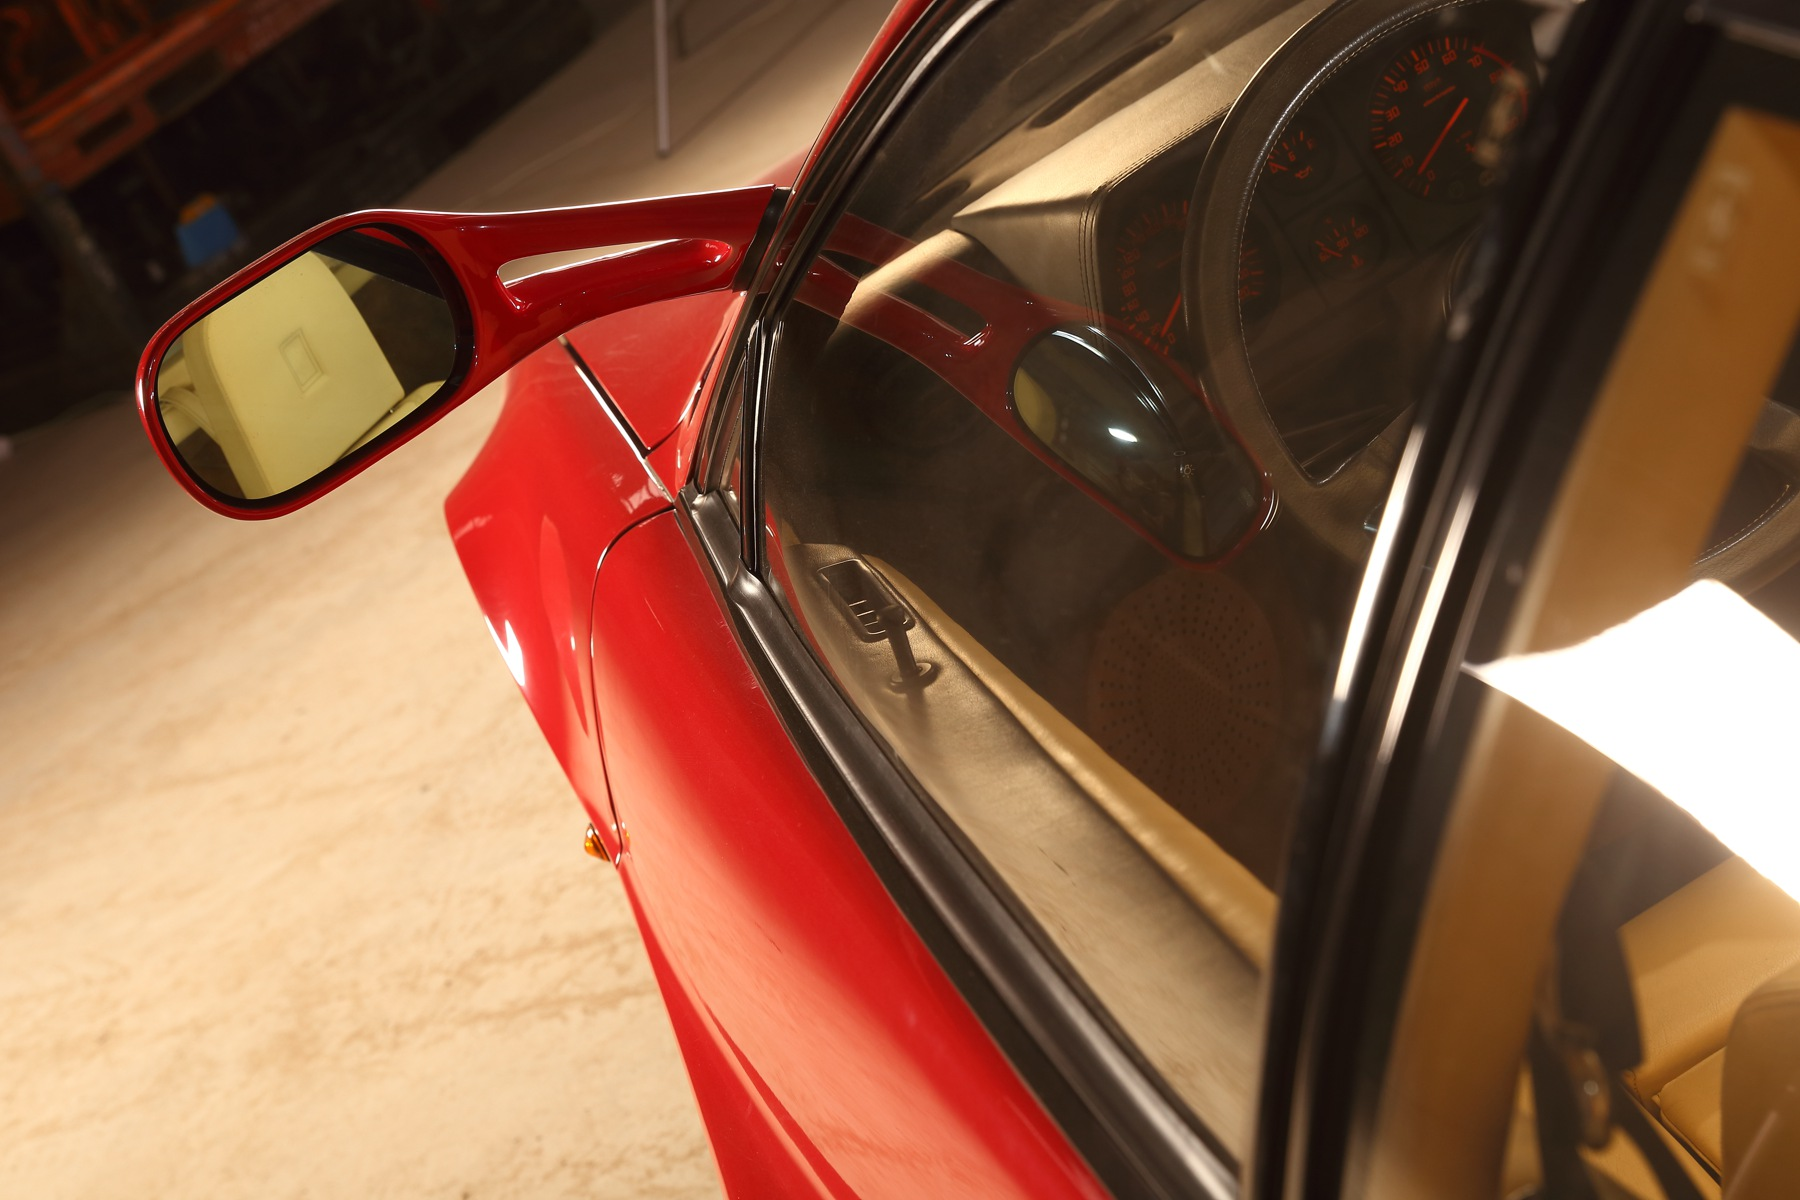 007 2016_03_16_Ferrari Testarossa I 040